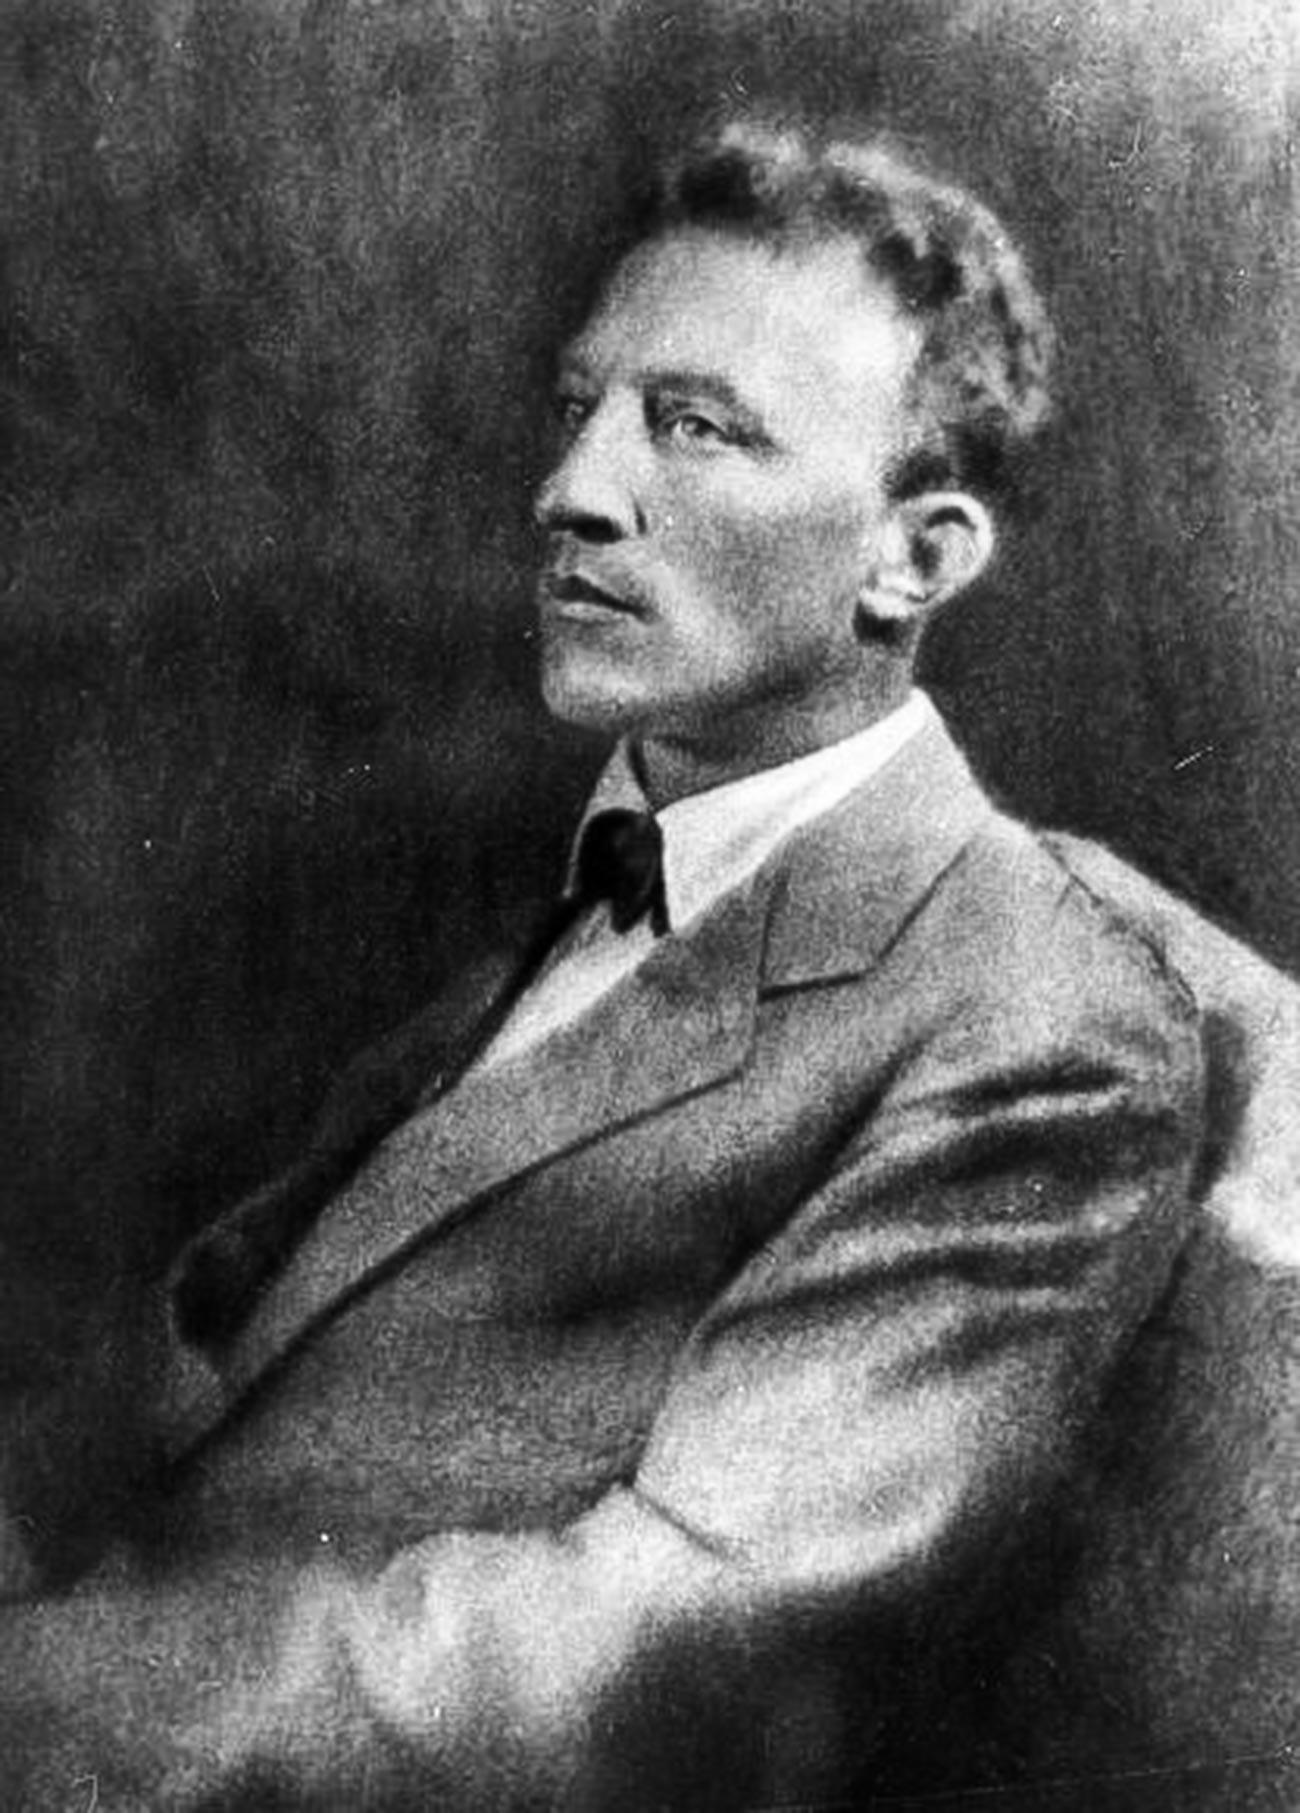 Silver-age poet Alexander Blok, 1920